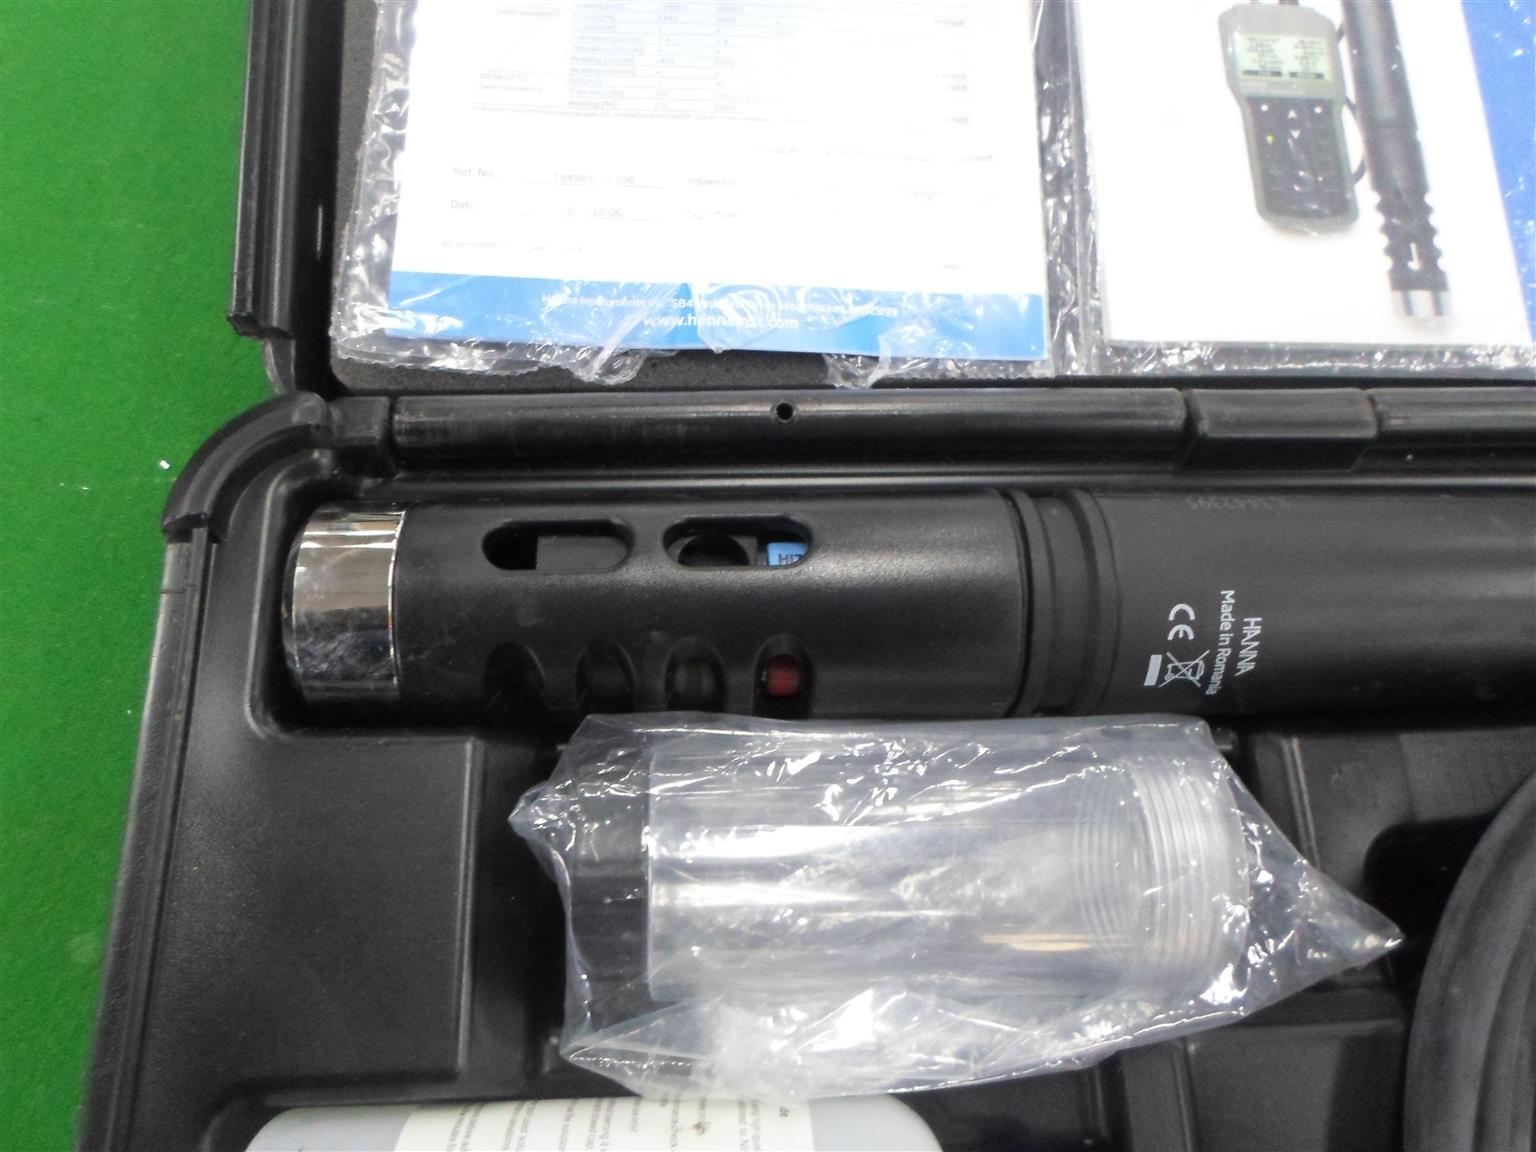 Hanna HI98194 Multiparameter Waterproof Meter